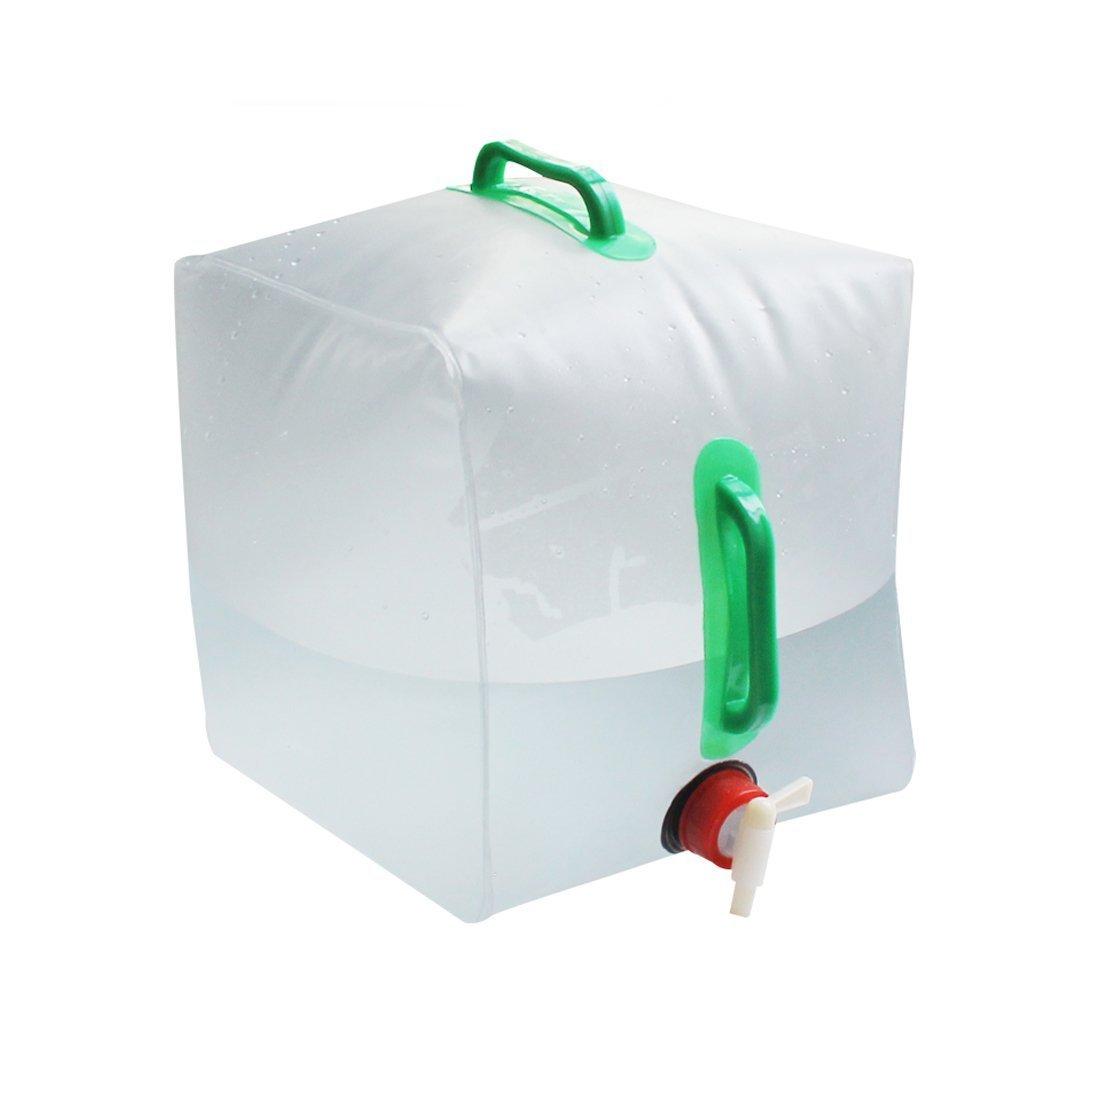 5 gallon 20l portable water carrier bag storage. Black Bedroom Furniture Sets. Home Design Ideas